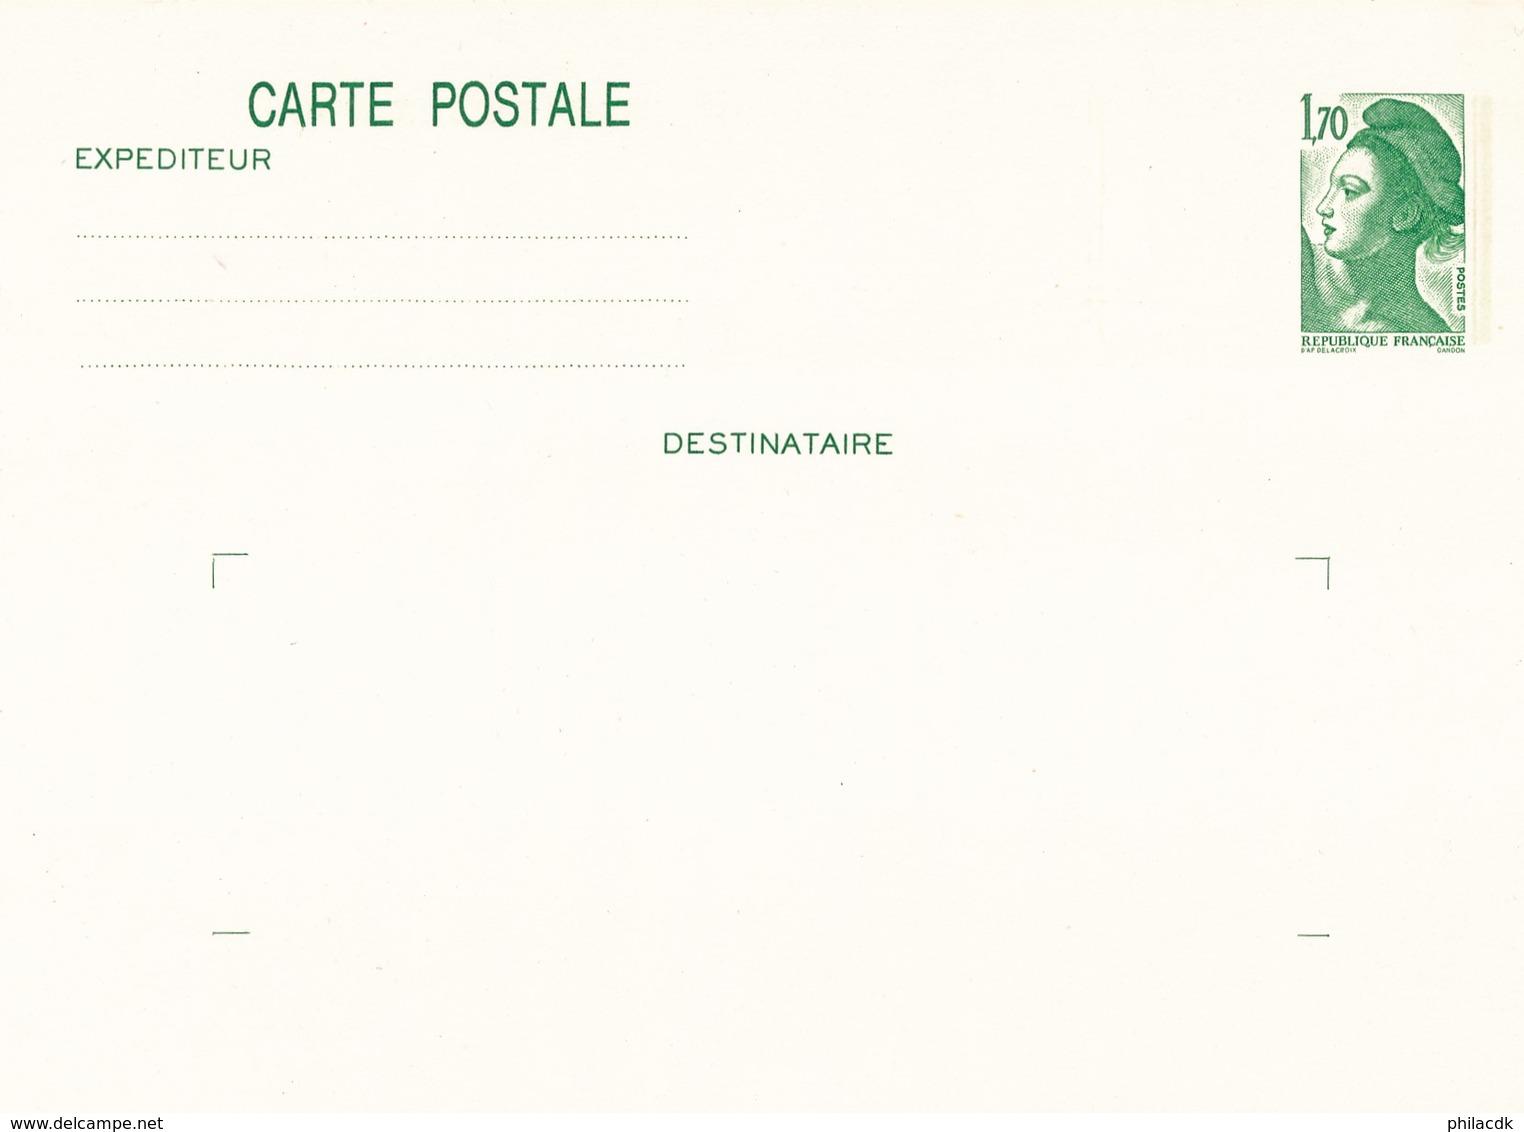 FRANCE - ENTIER POSTAL CARTE POSTALE NEUF N°YT 2318-CP1 - COTE YT : 1.60€ - 1982-88 - Entiers Postaux